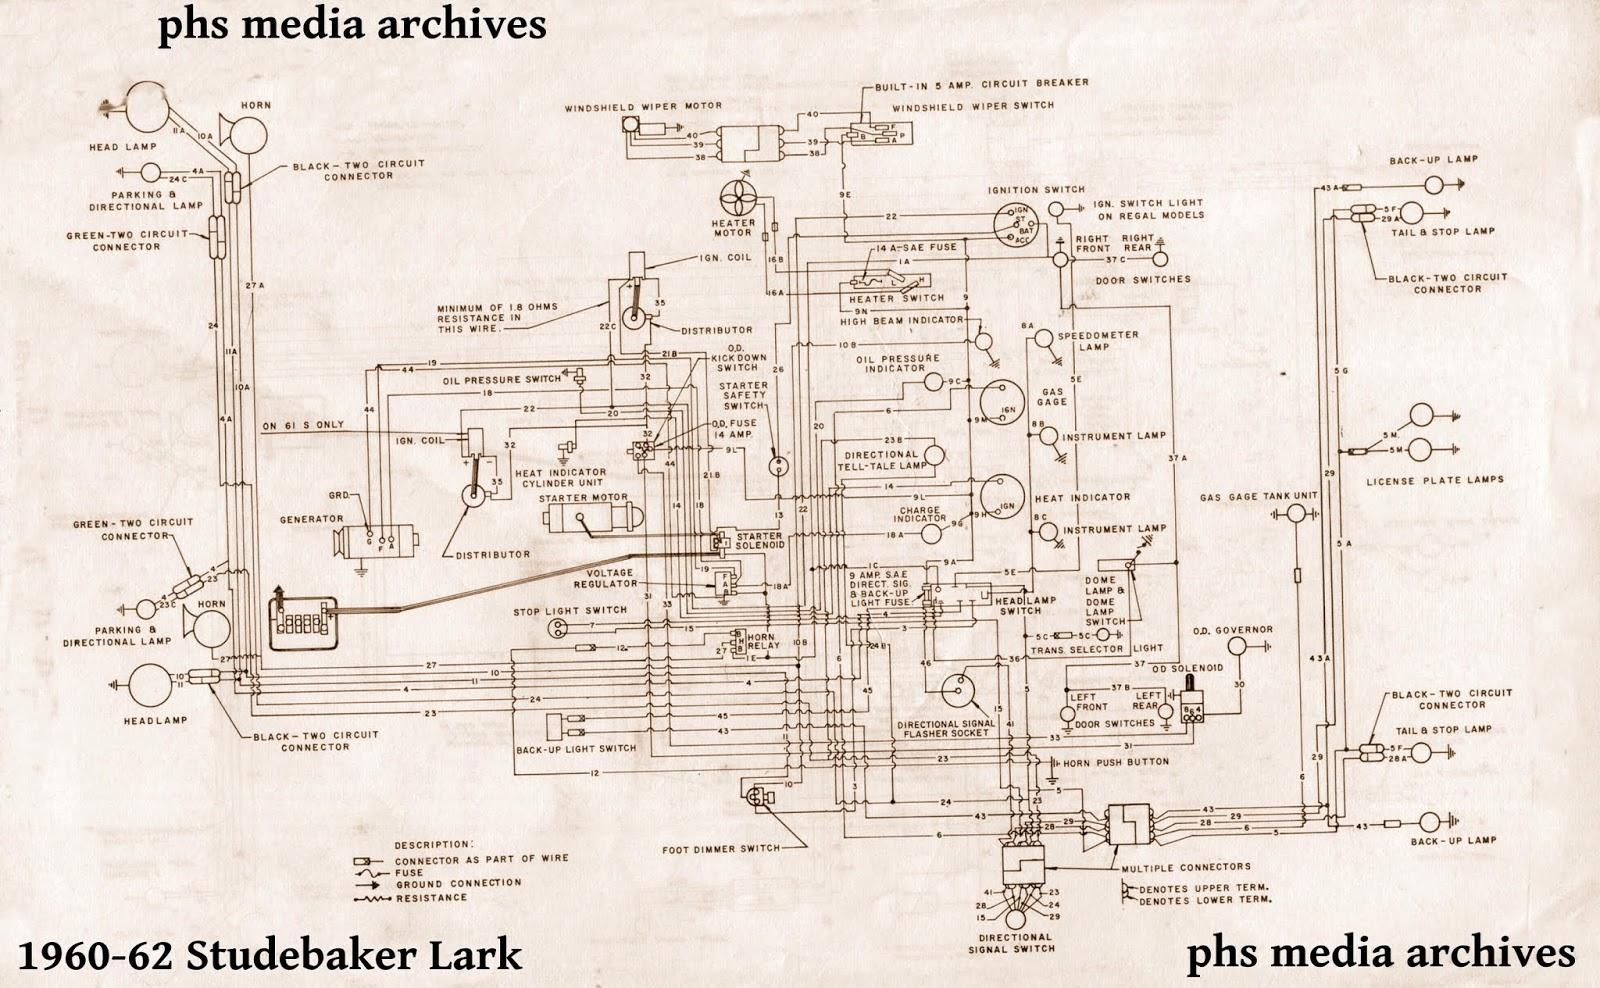 medium resolution of 55 studebaker wiring diagram wiring diagram datasourcetech series studebaker lark u0026 cruiser wiring diagrams 55